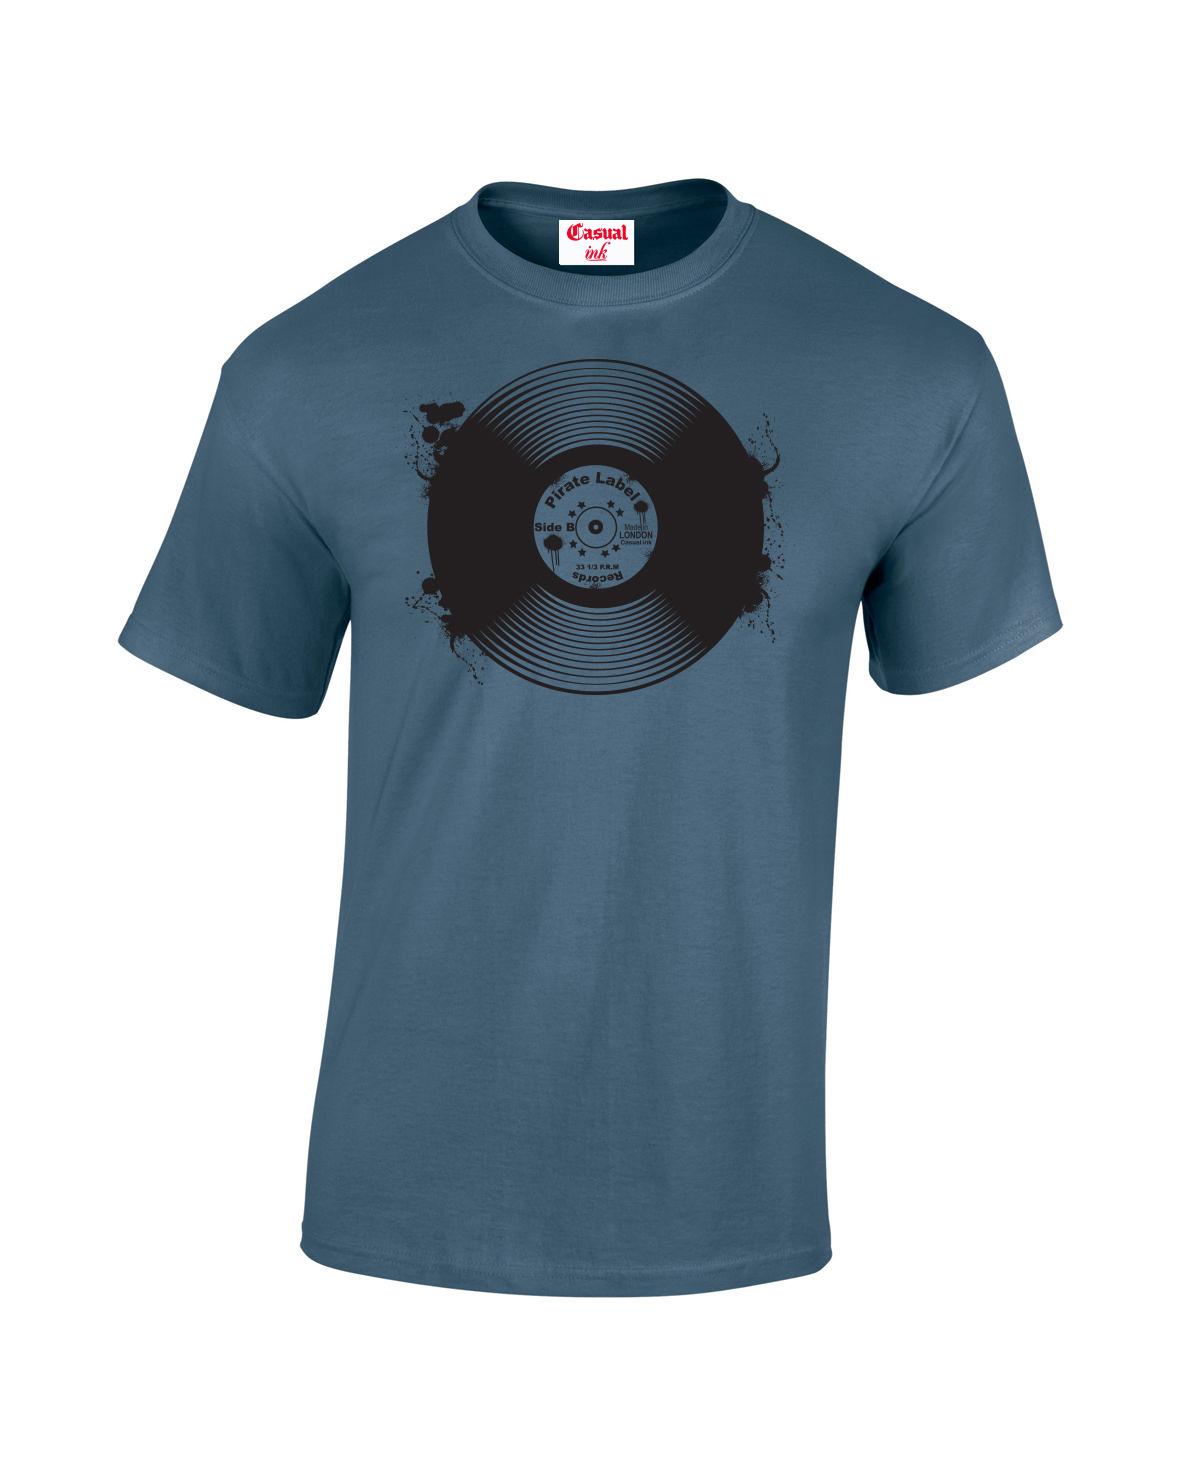 records(Indigo-Blue)